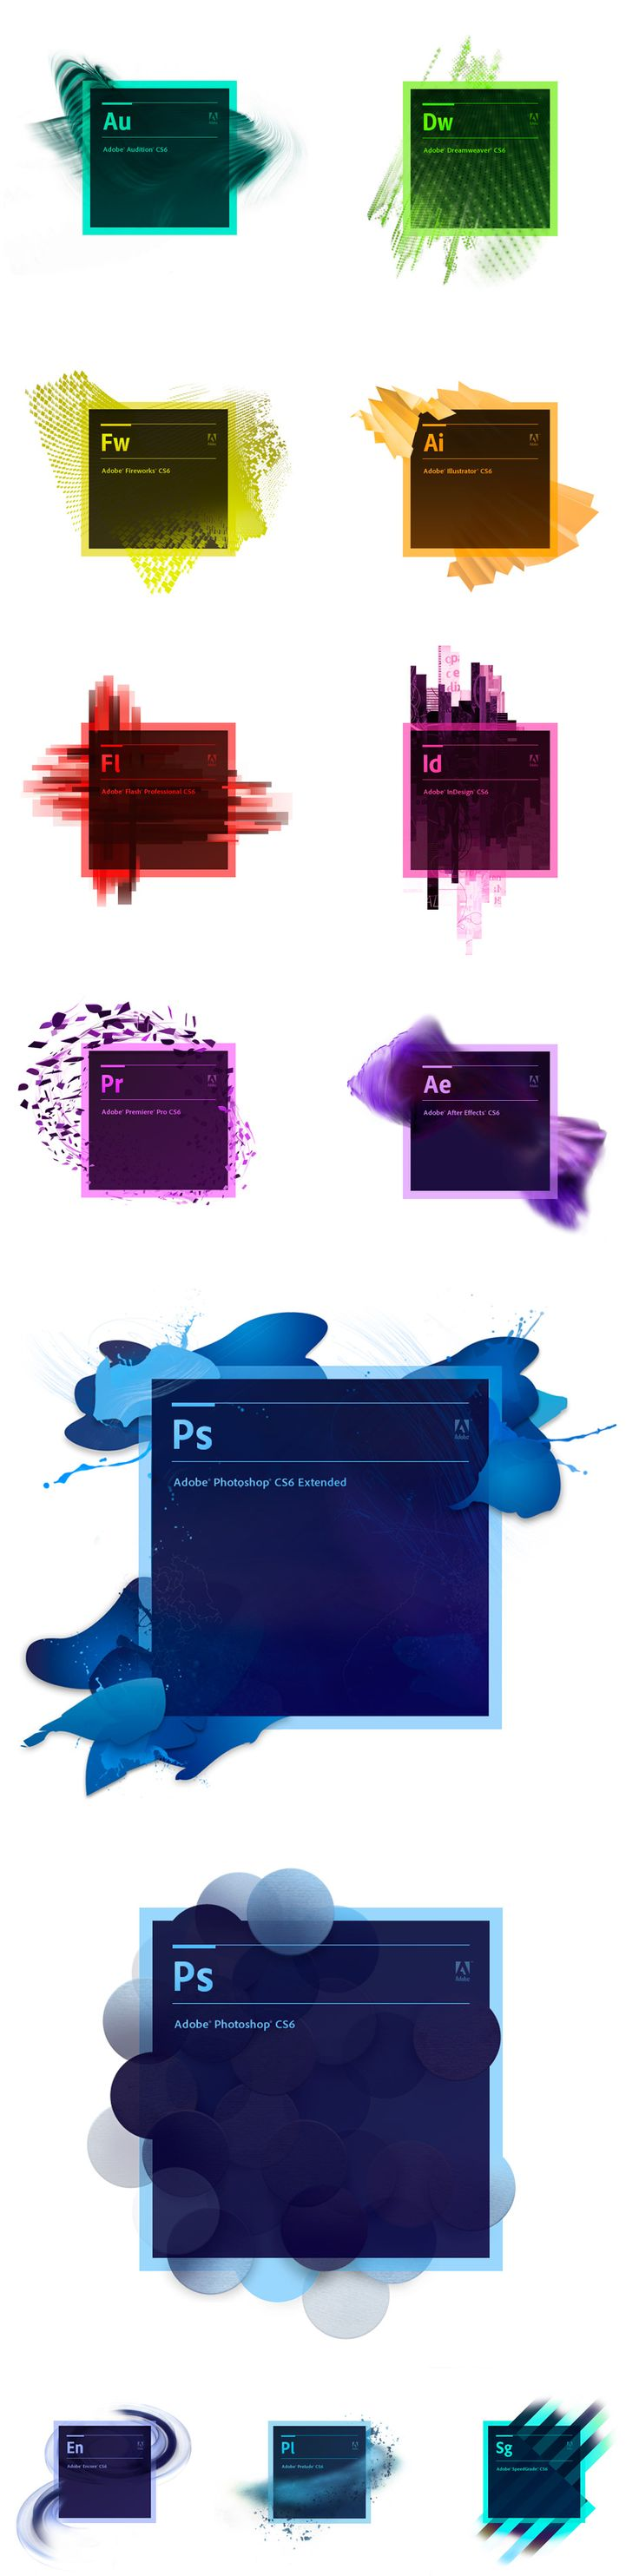 The new Adobe CS6 branding | #stationary #corporate #design #corporatedesign #logo #identity #branding #marketing <<< repinned by an #advertising agency from #Hamburg / #Germany - www.BlickeDeeler.de | Follow us on www.facebook.com/BlickeDeeler